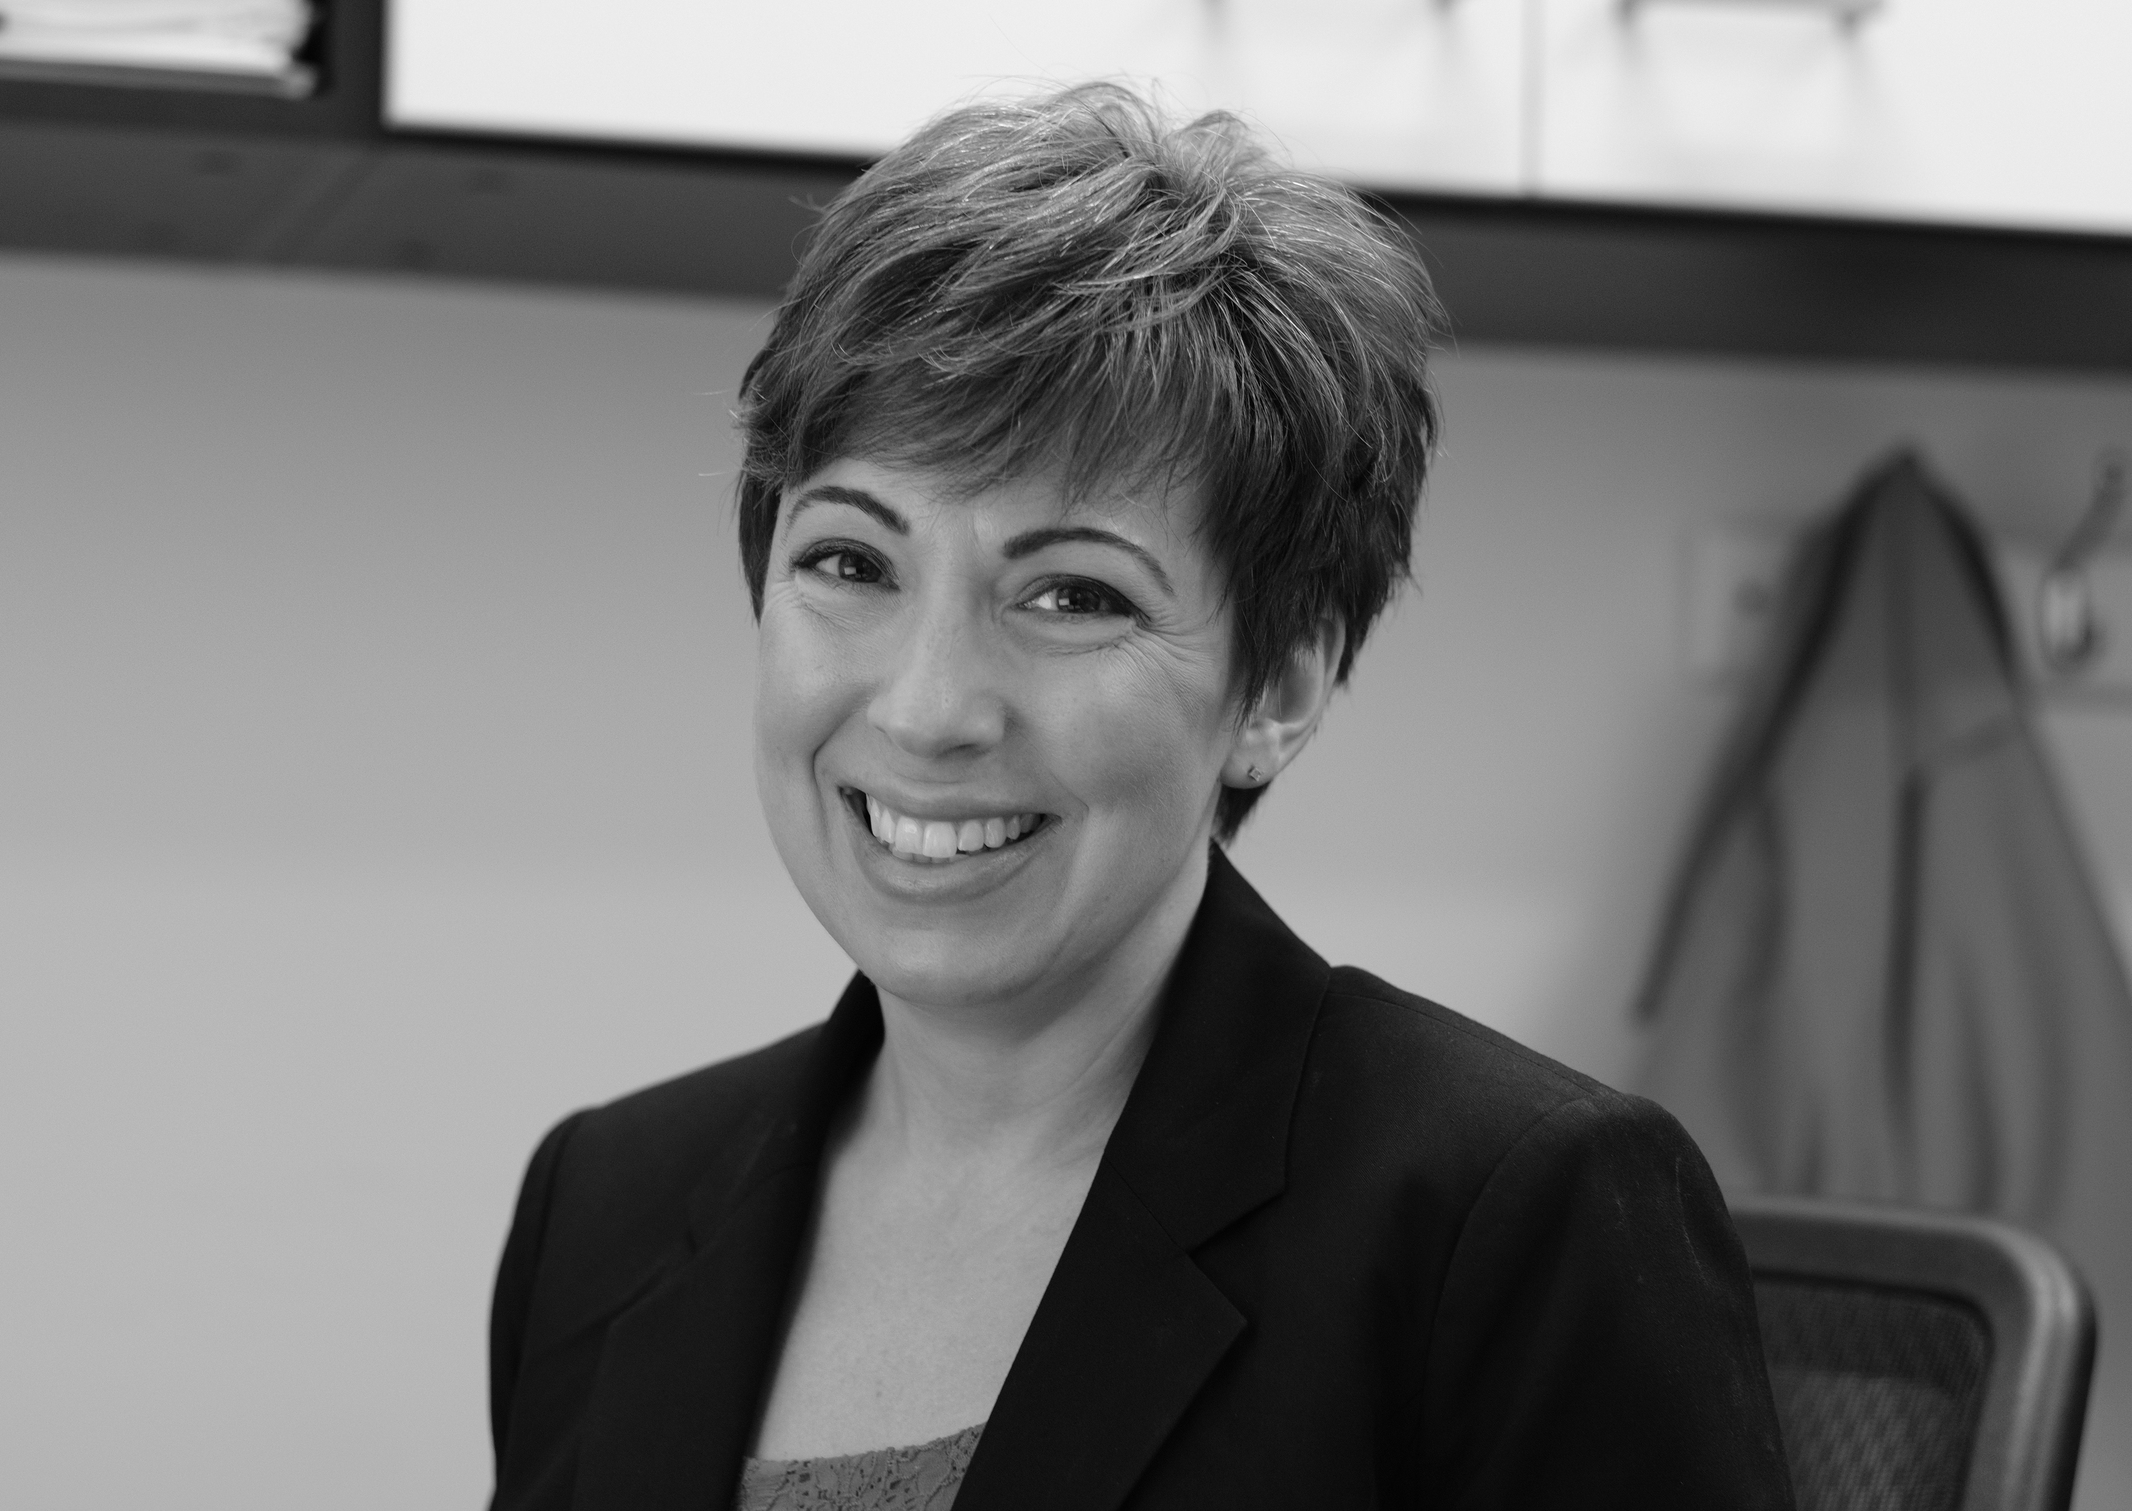 PATRICIA RUDISILL-HEISEY <BR>VP, Internal Operations